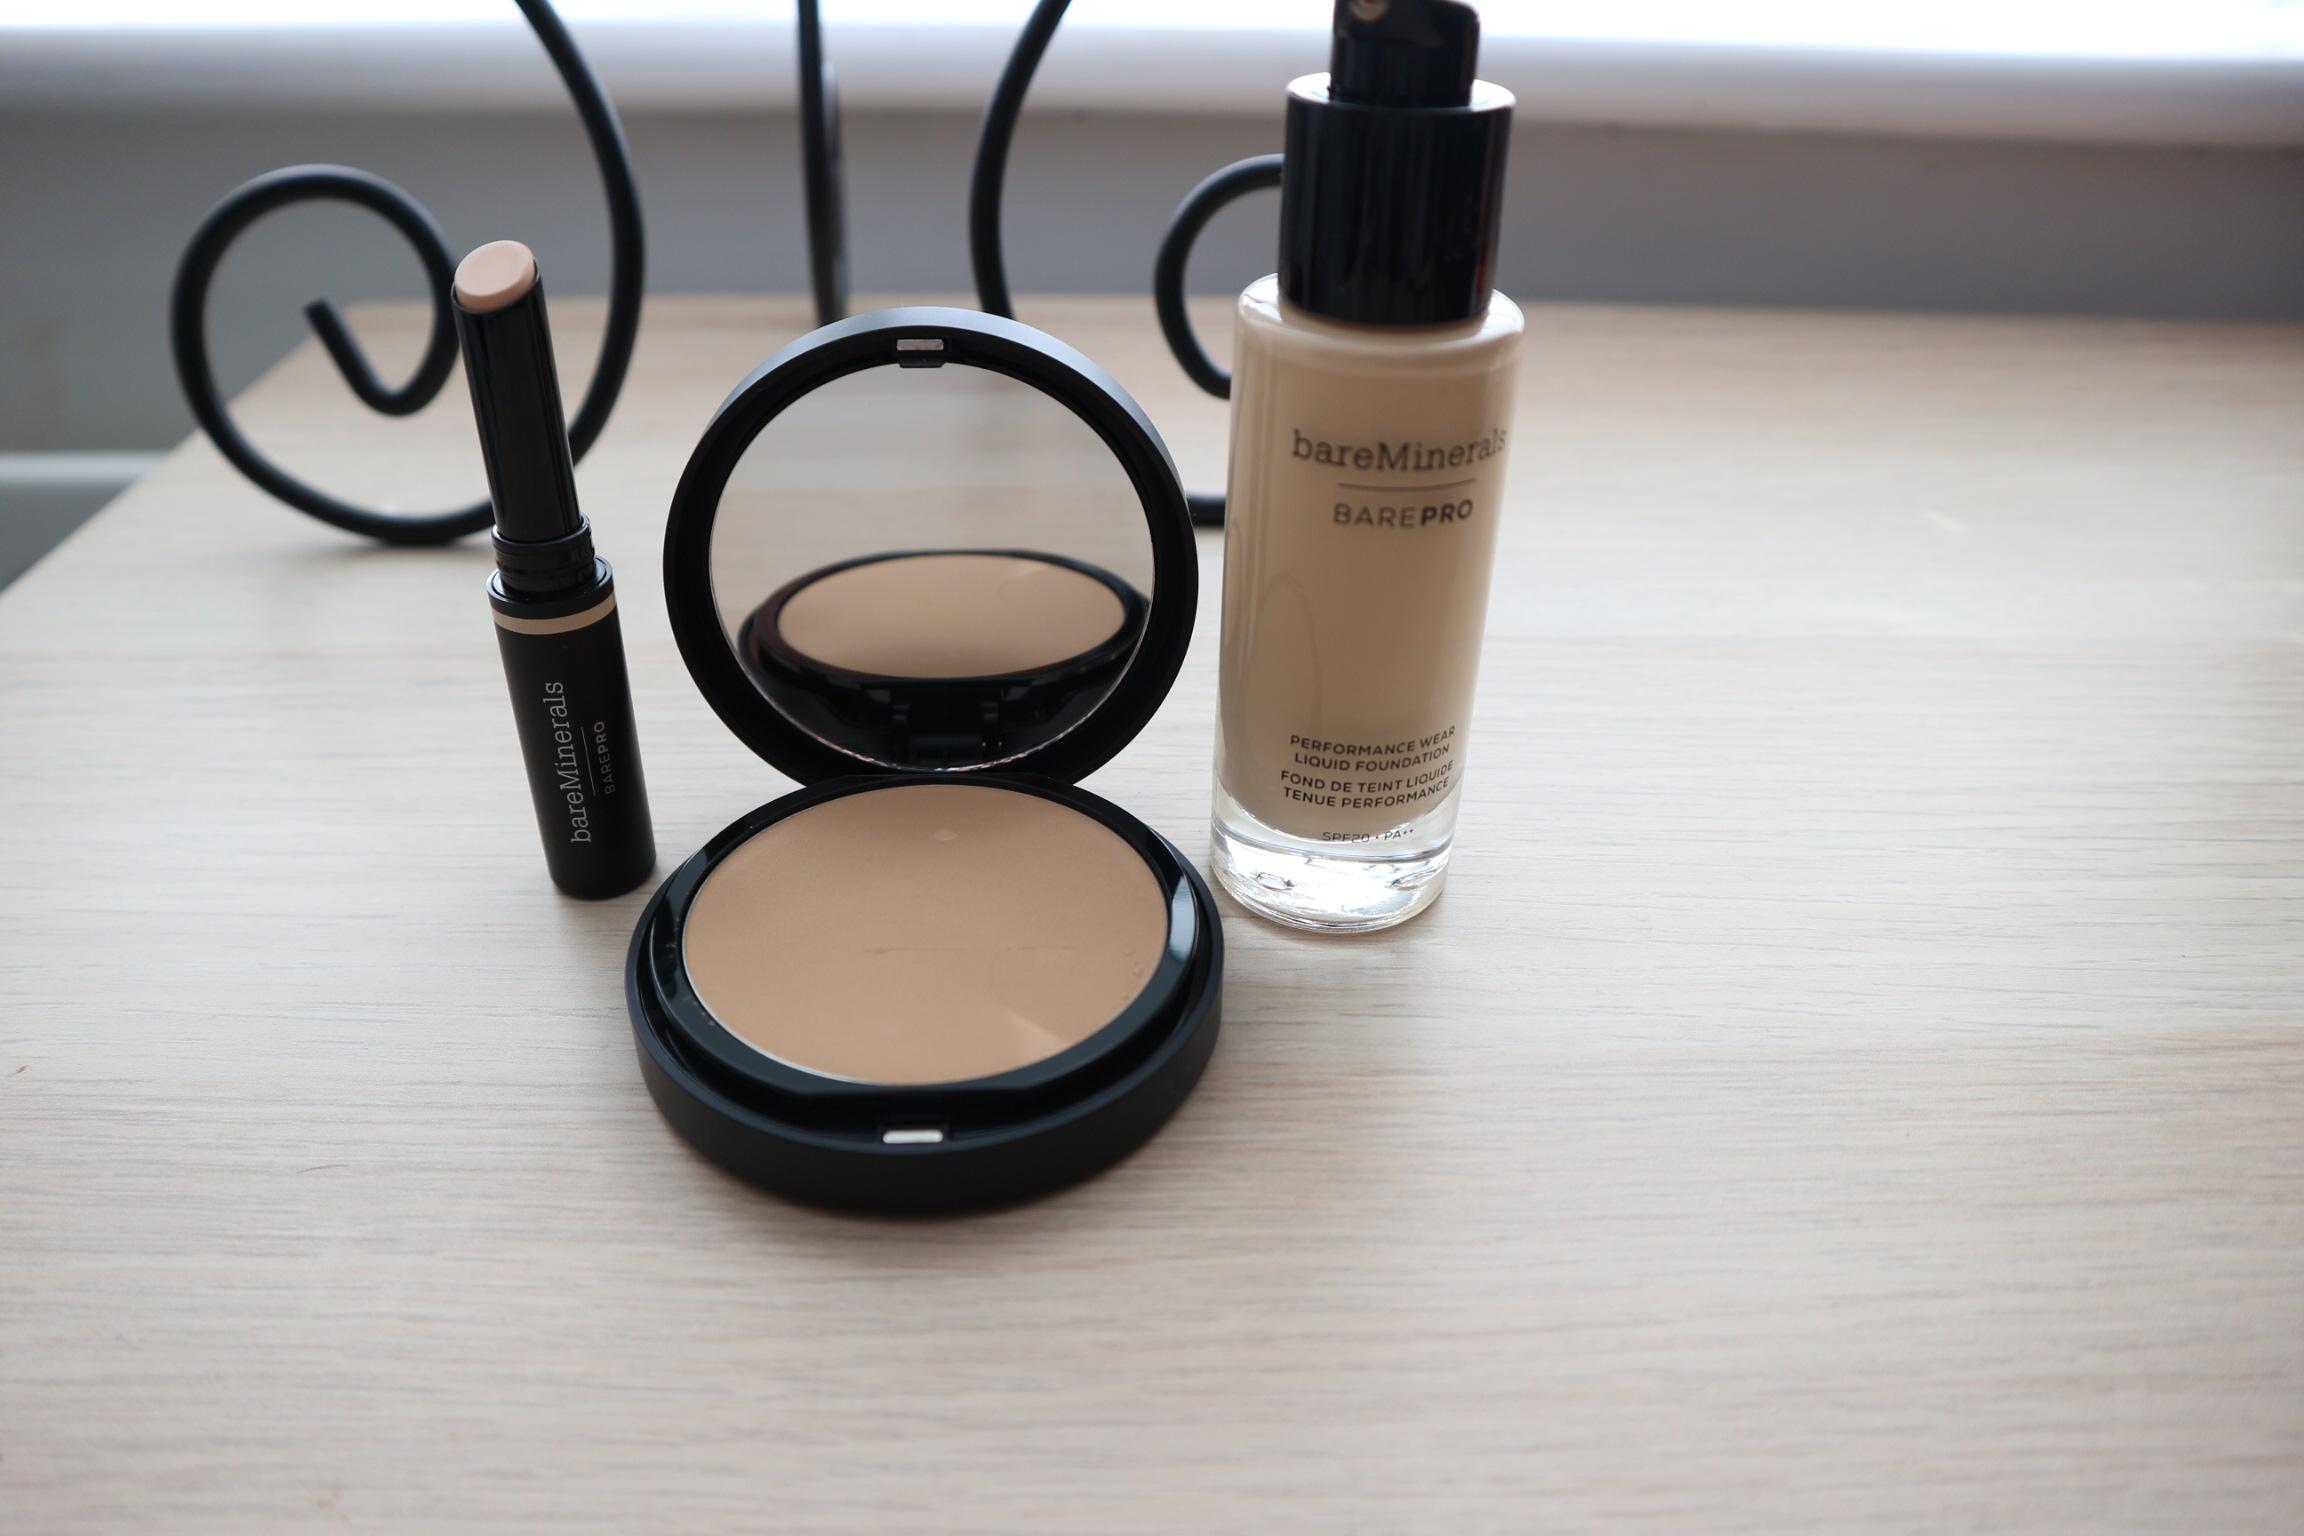 performance wear foundation